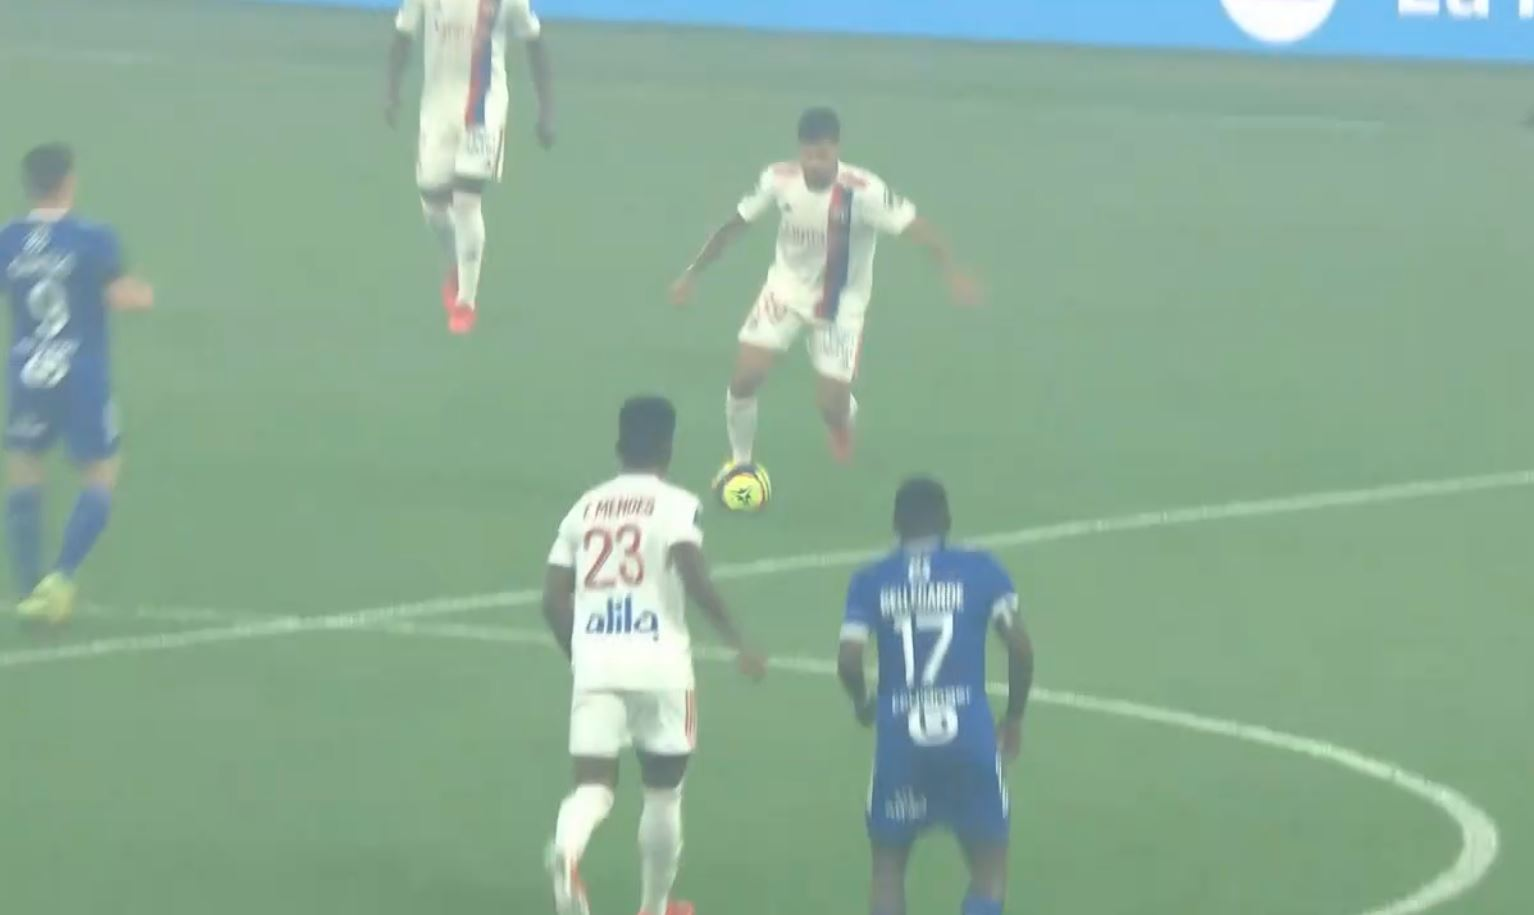 Lyon 3-1 Strasbourg 2021.09.12 (19h45) Watch Full Goals Highlight